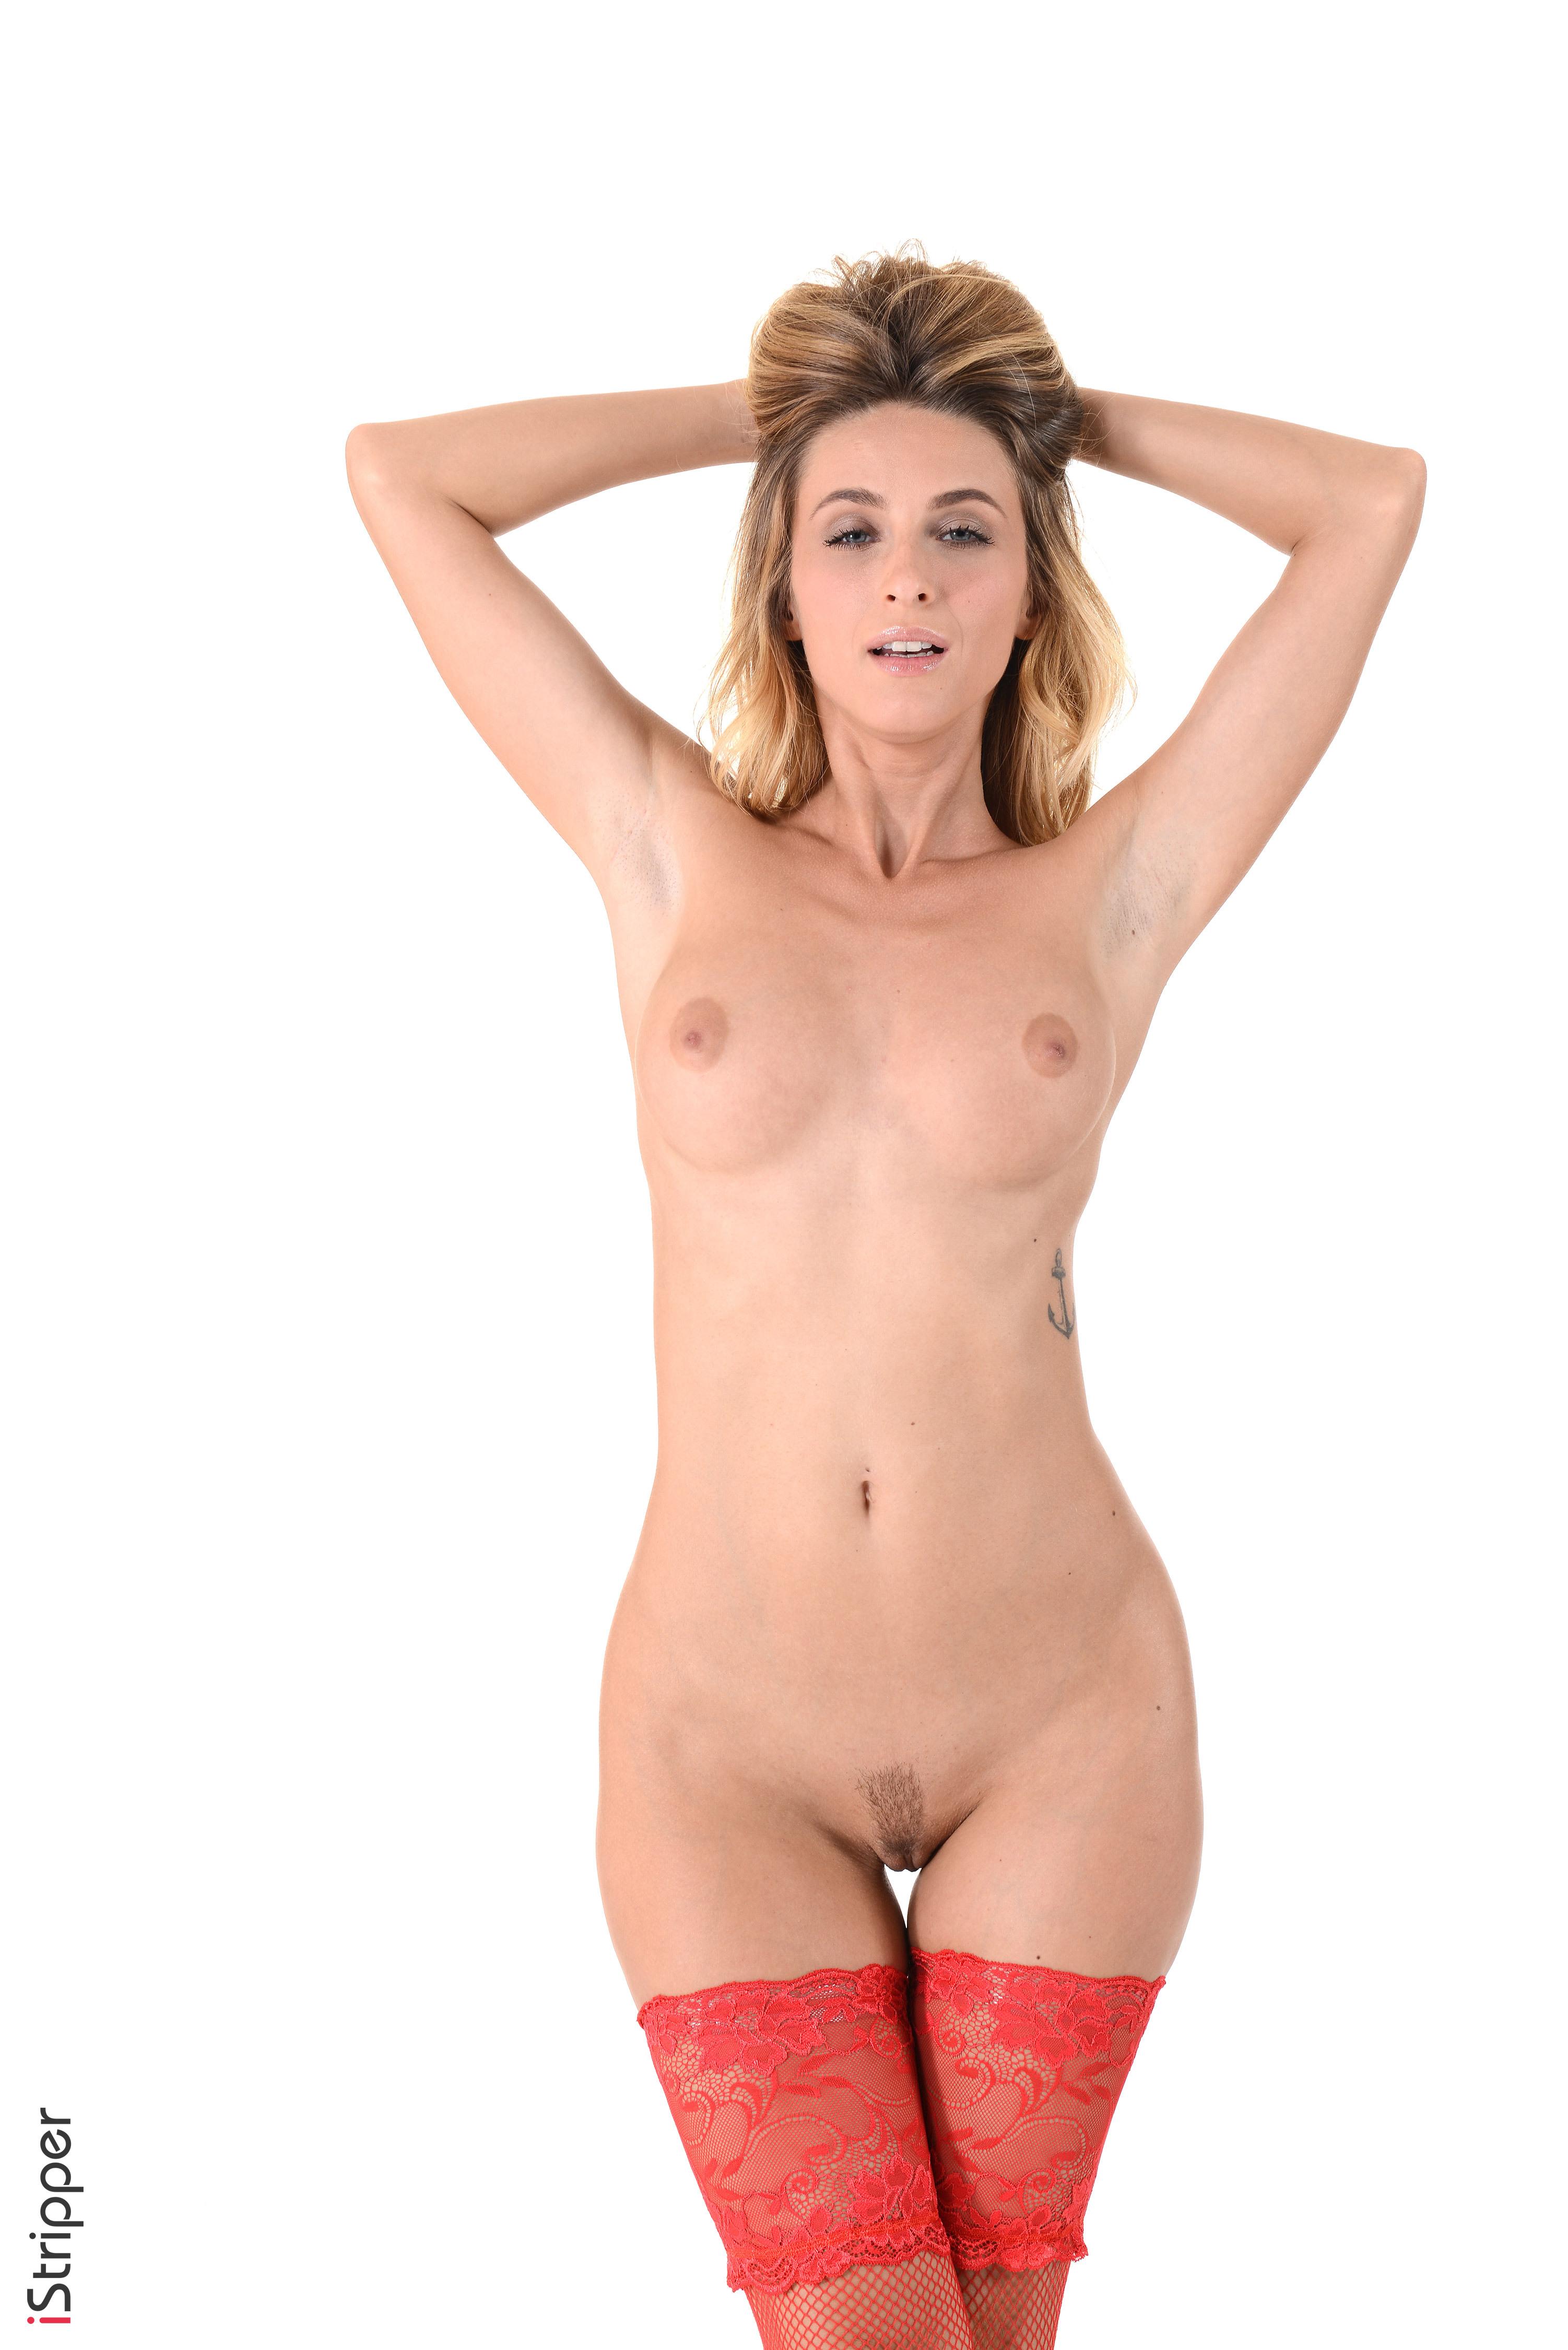 nude hd wallpapers